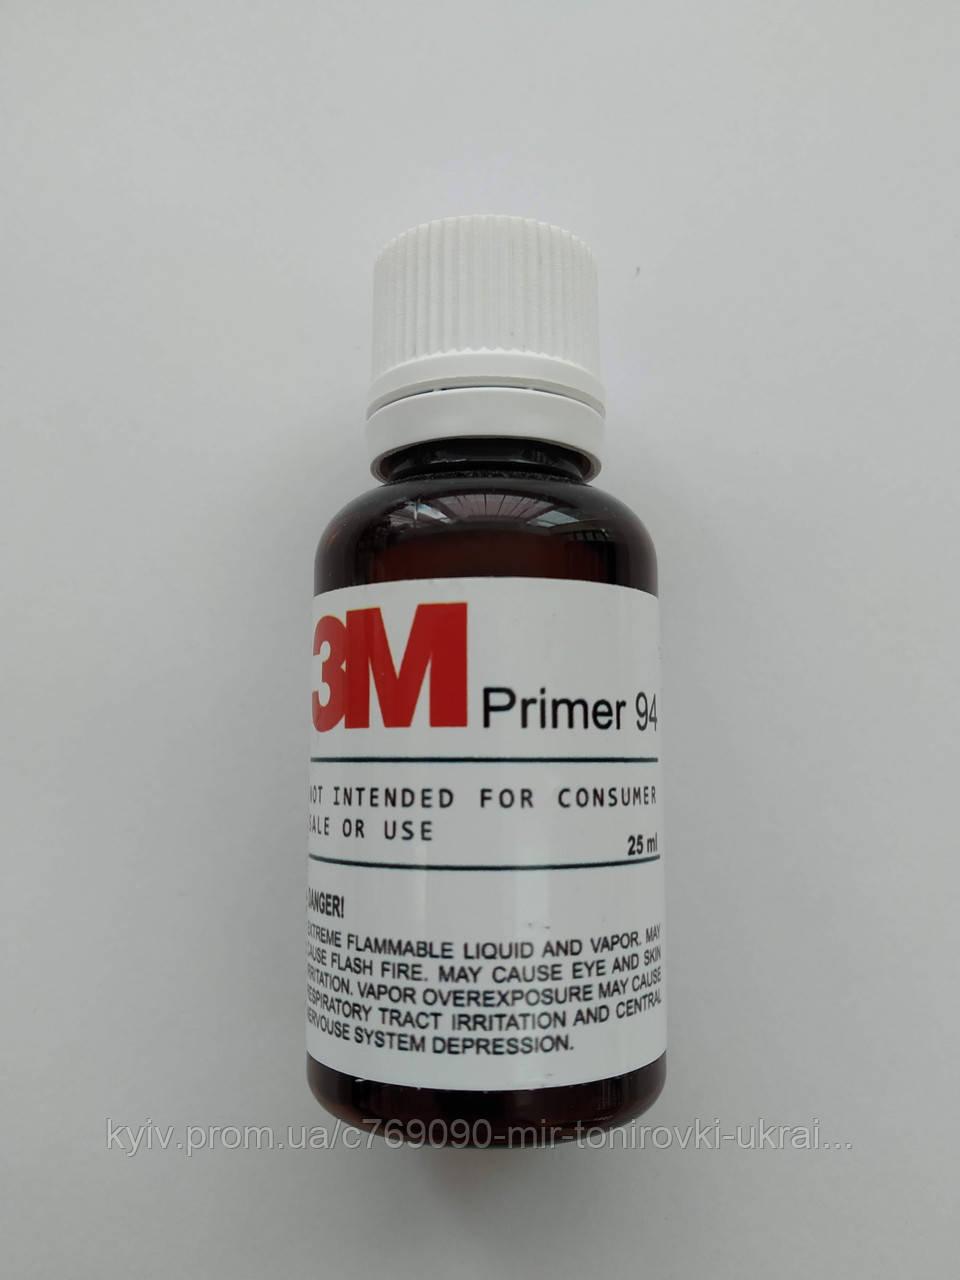 Праймер ЗМ 94 (25 мл)